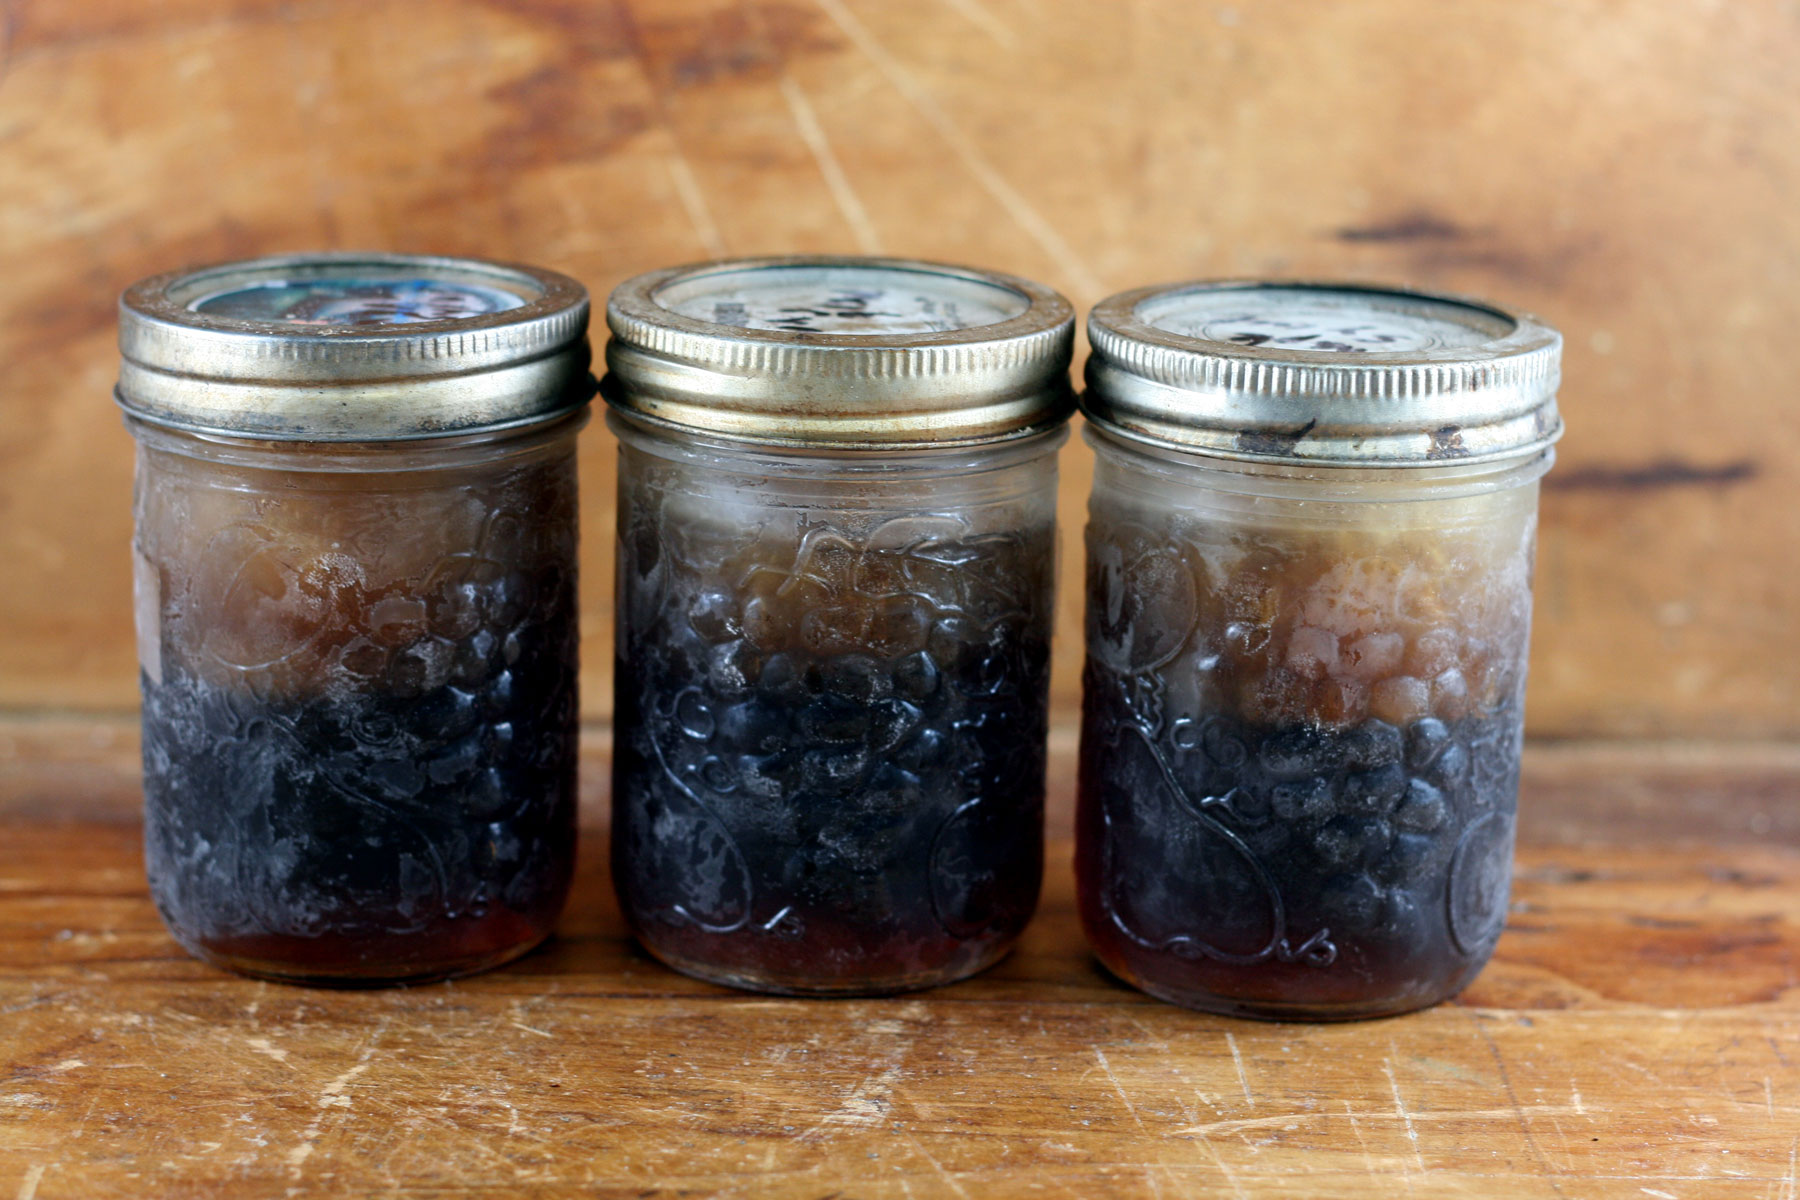 Frozen maple syrup in Mason jars